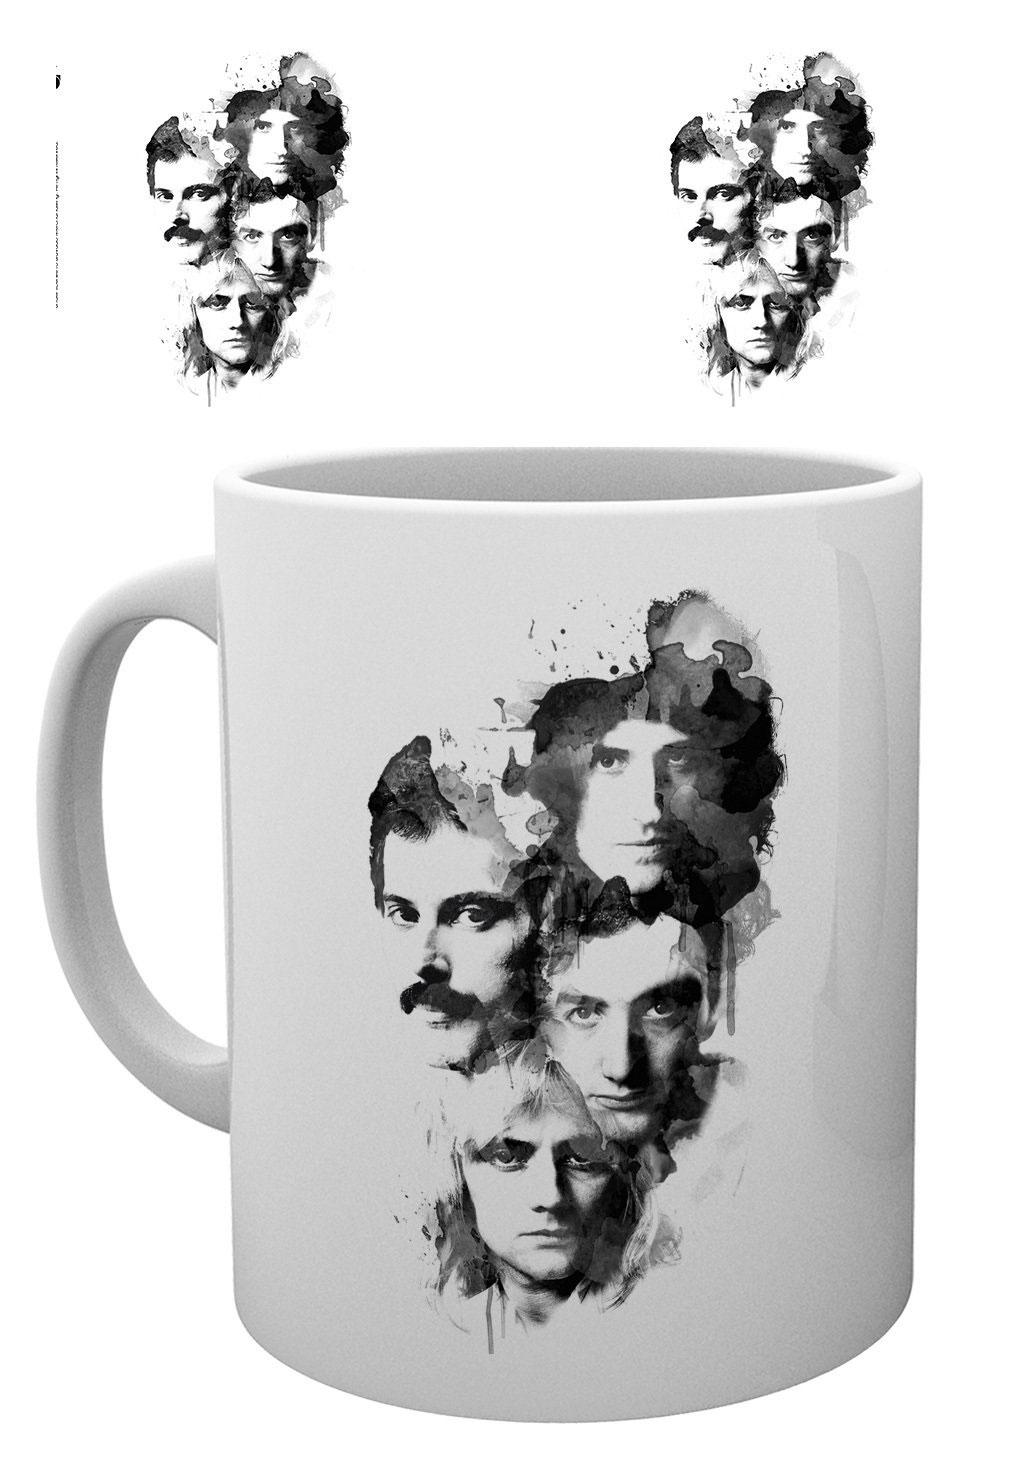 Queen Mug Faces (Bravado)